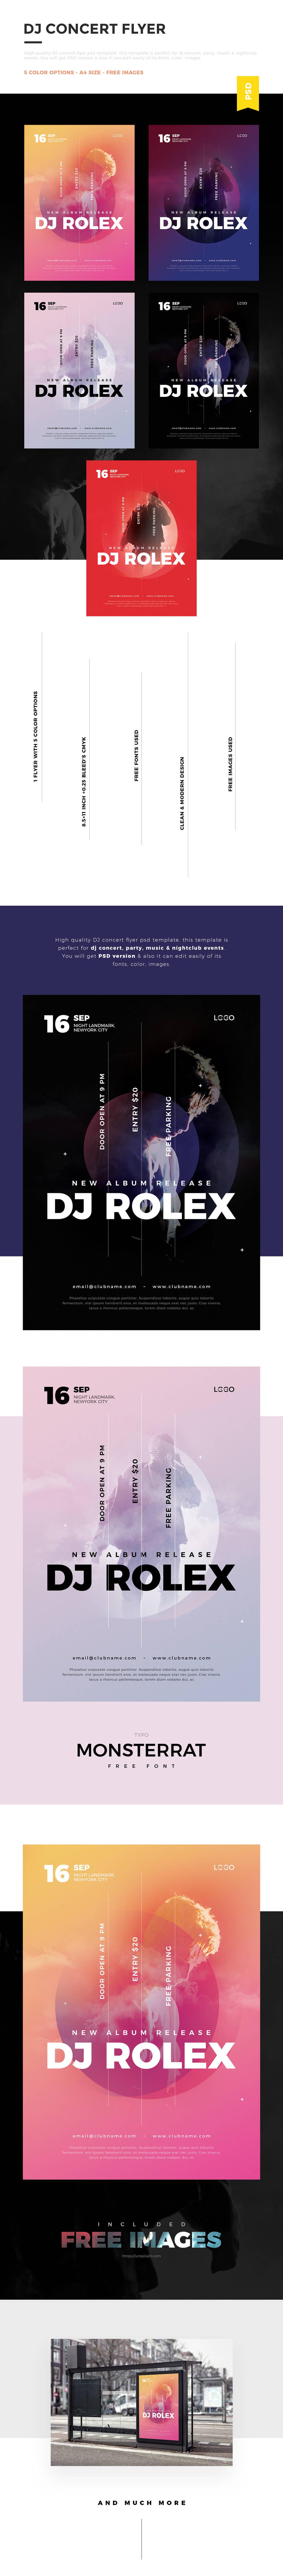 DJ Concert Flyer / DJ Poster by webduckdesign